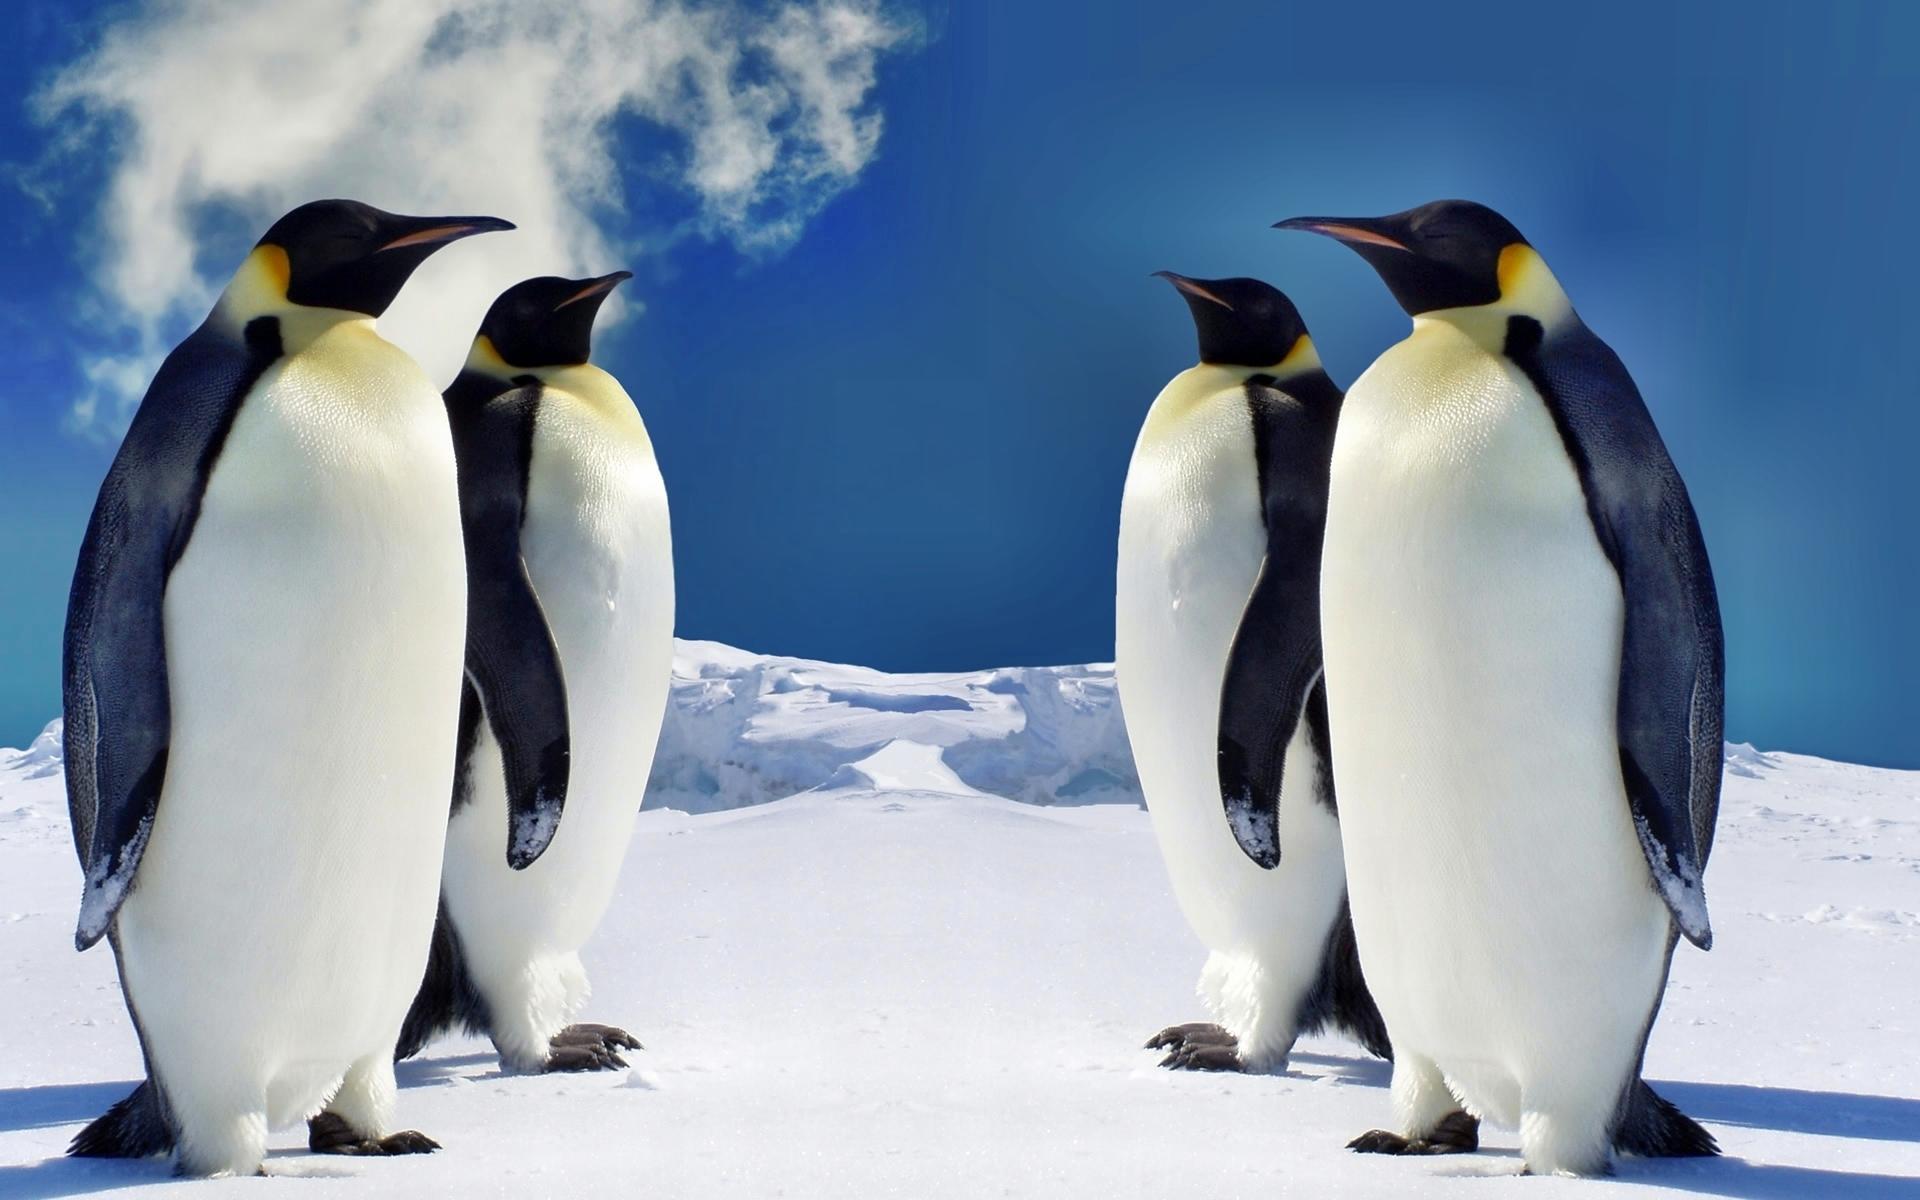 Le Zodiarc-en-ciel 03-pingouin-pingouins-animaux